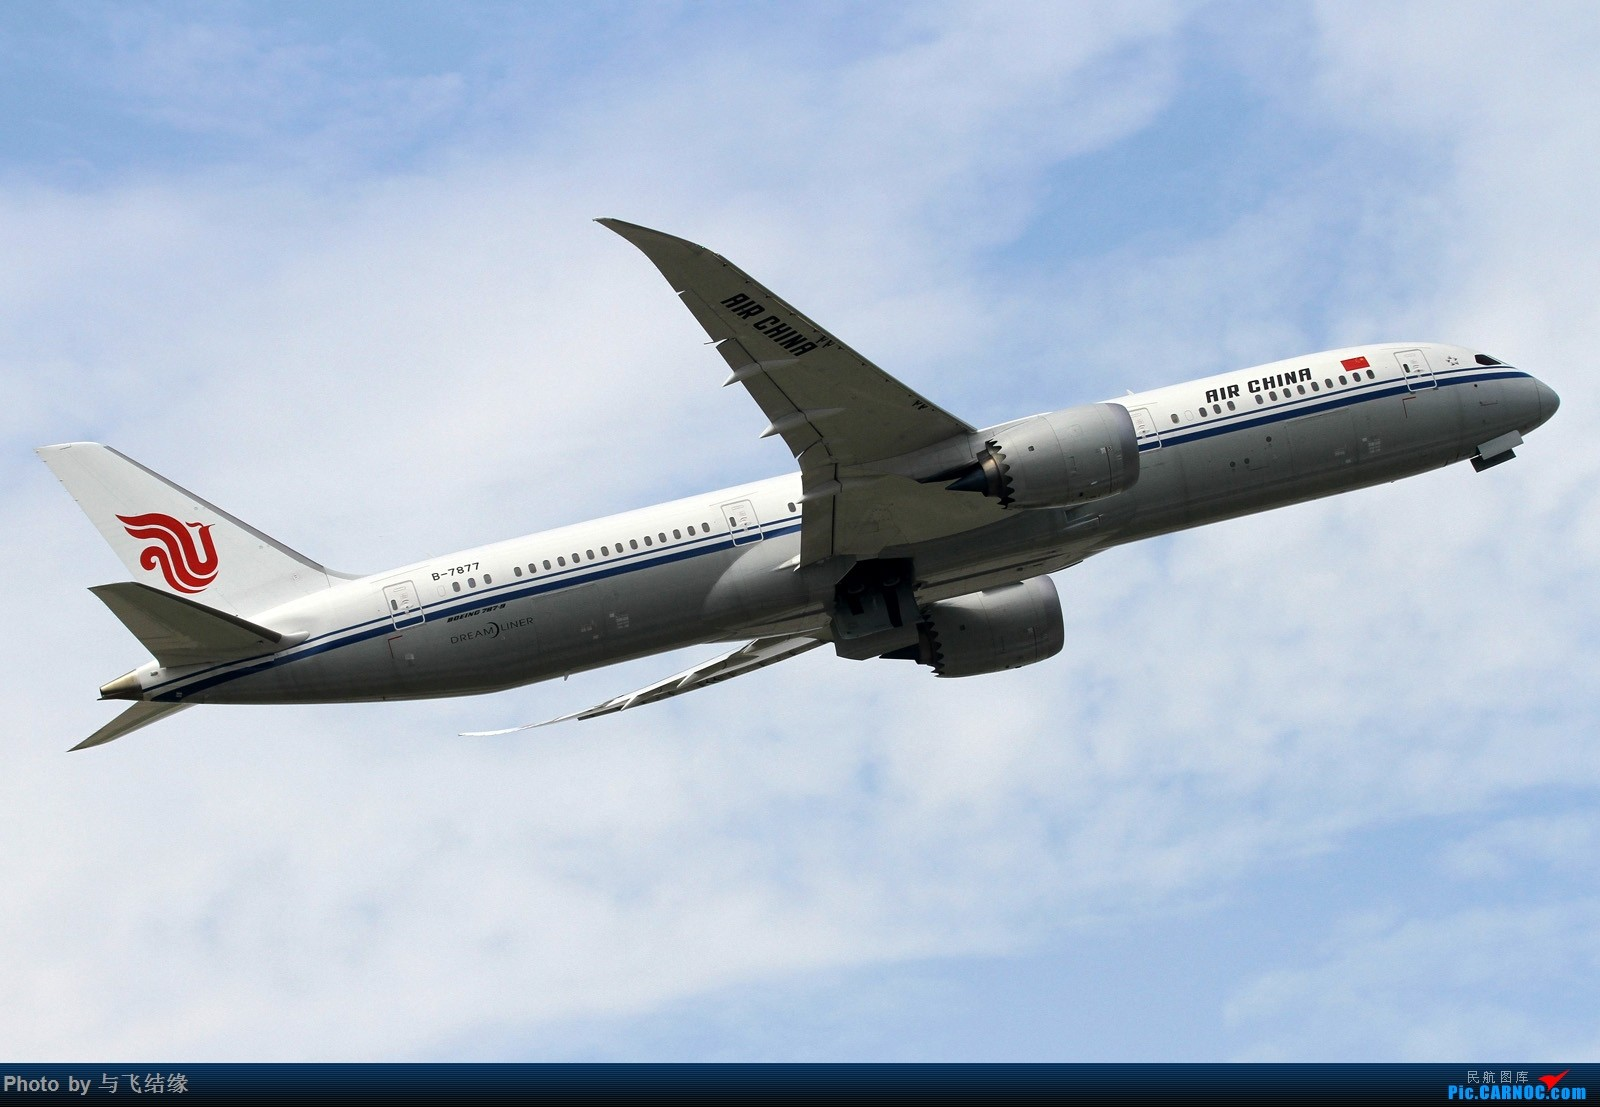 "Re:[原创]山东航空最新波音737-800彩绘机""好客山东—景芝号""及其其它的一些一些! BOEING 787-9 B-7877 中国北京首都国际机场"